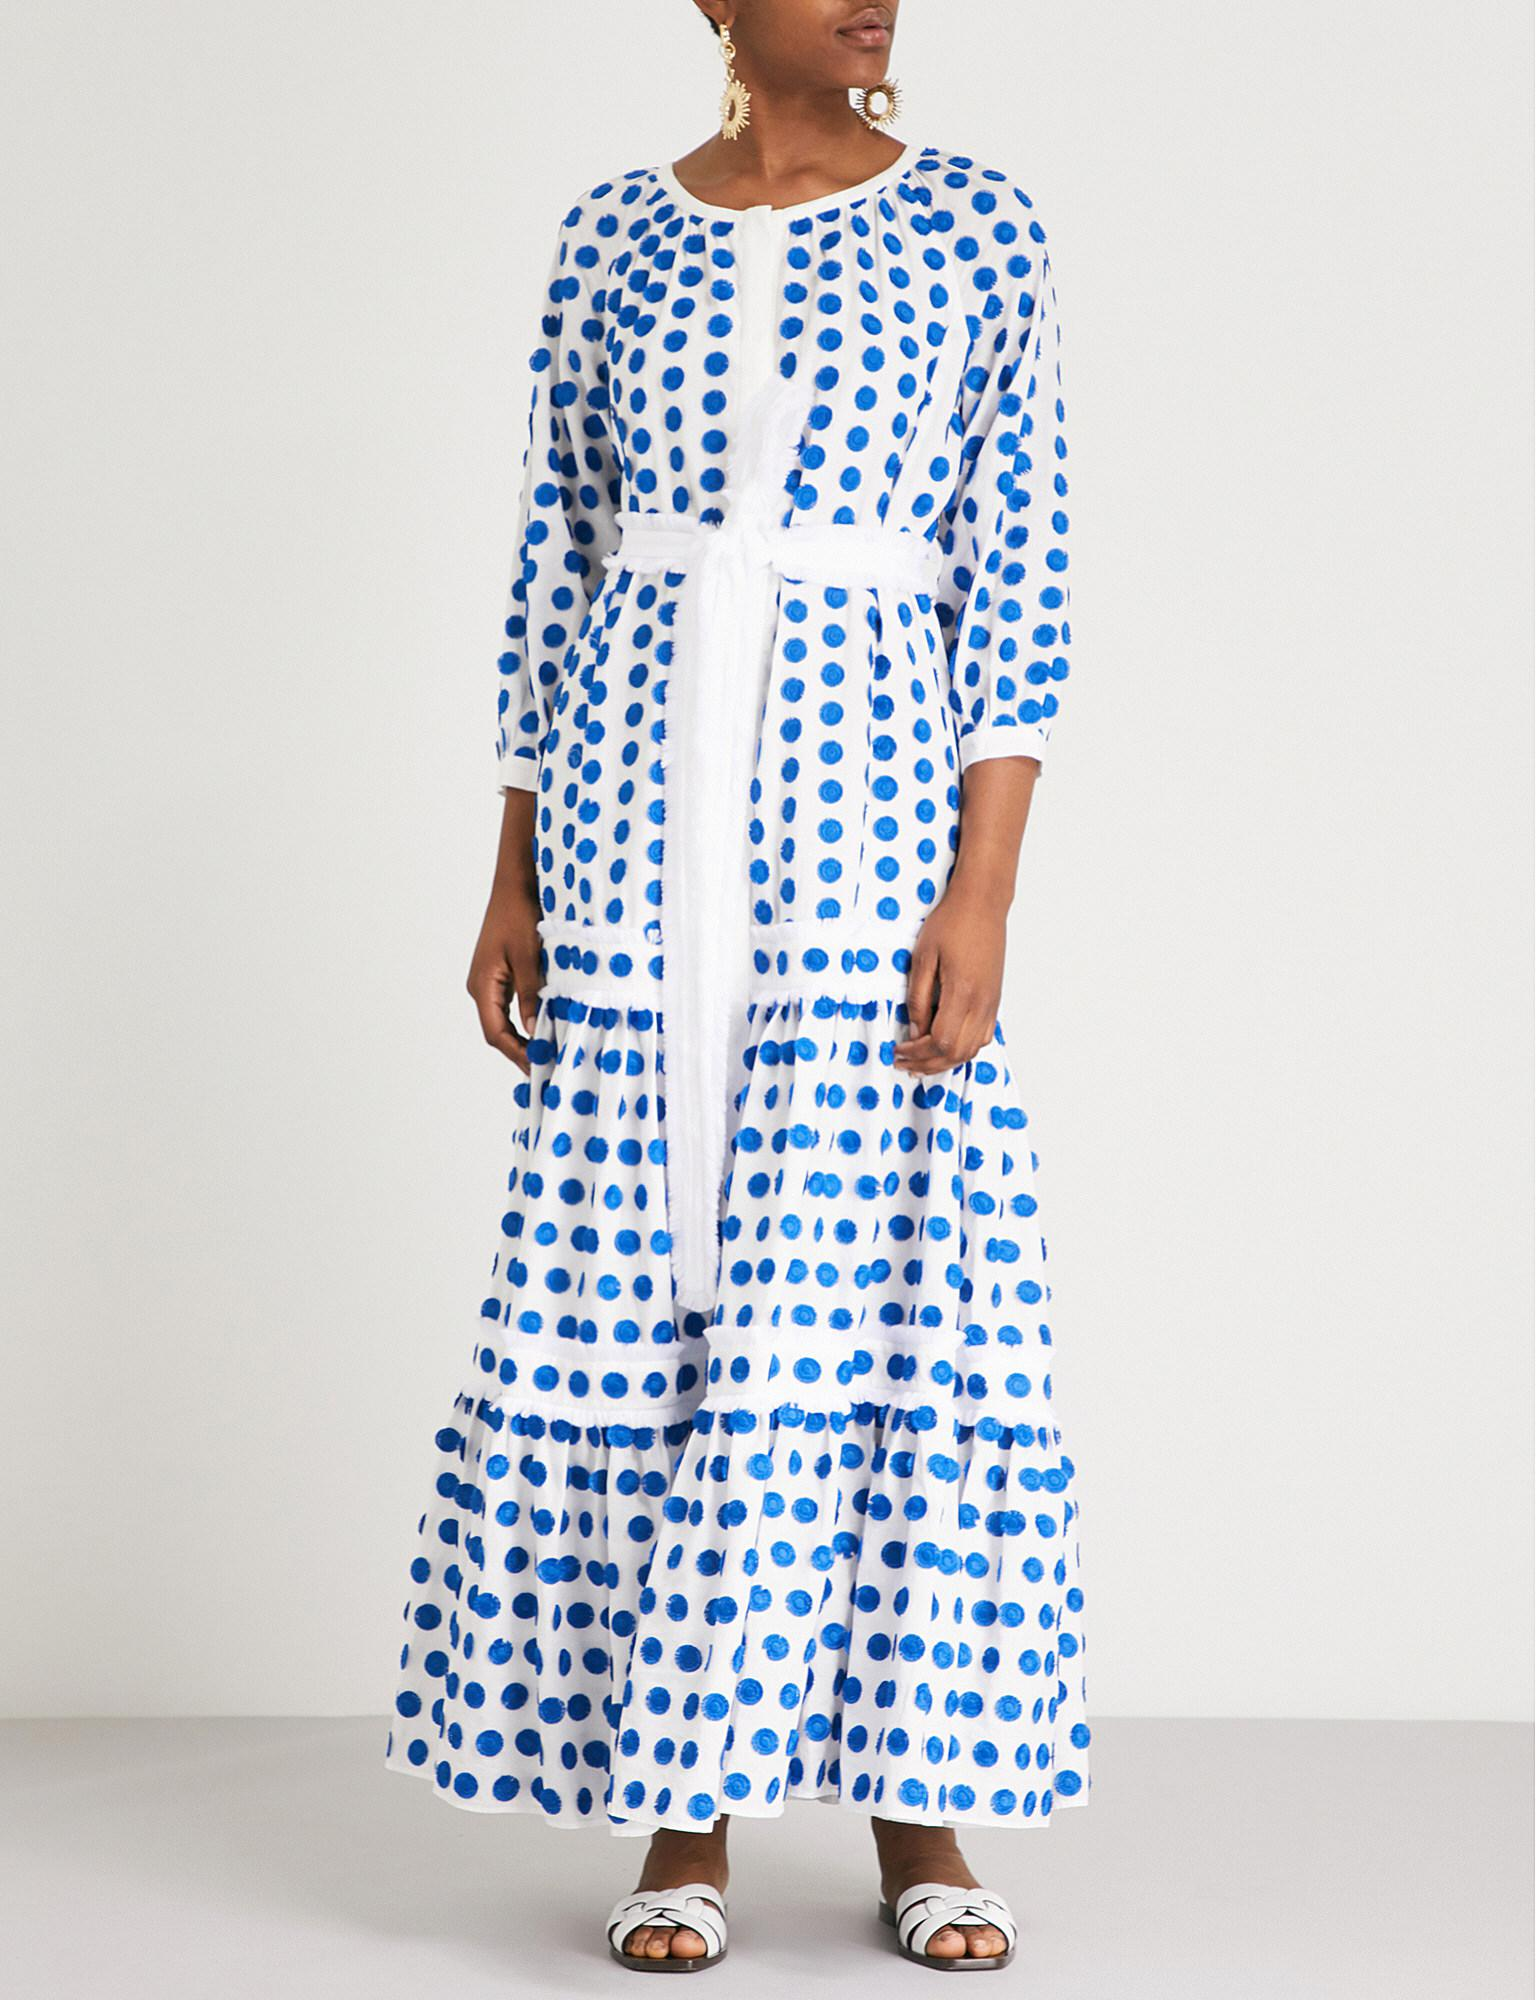 c0c11afc22d Alexis Gaiya Dot-print Maxi Dress in Blue - Lyst